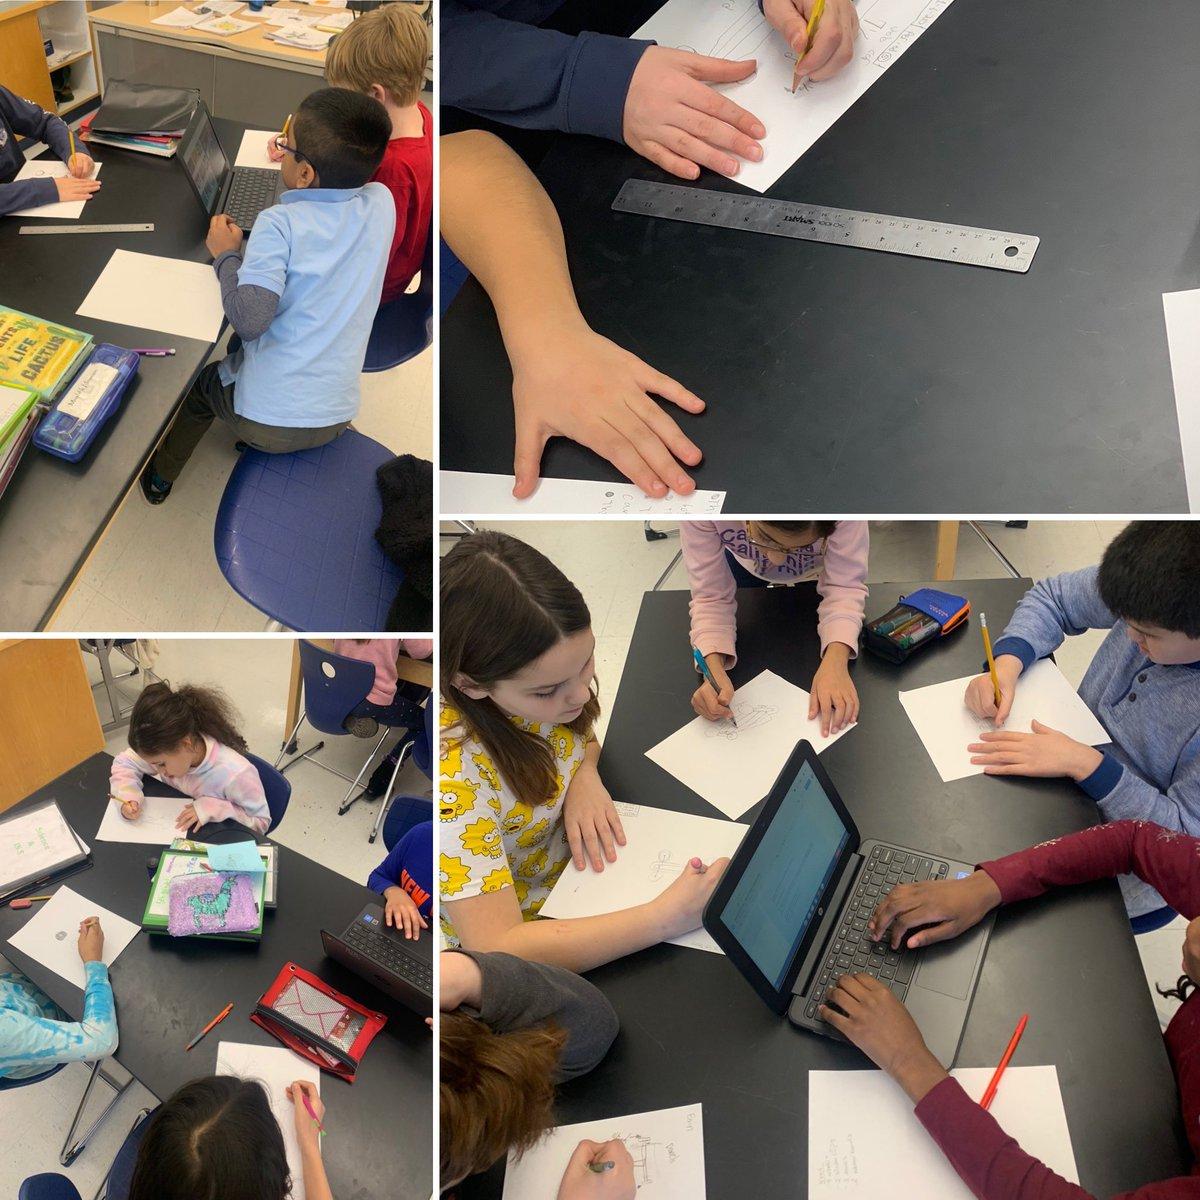 Grade 5 students creating design sketches for their race car challenge!  #racecarchallenge #criterionb #mypdesign #designsketches #developingideas #collaborationpic.twitter.com/knmR6ucxKz – at Rogers International School